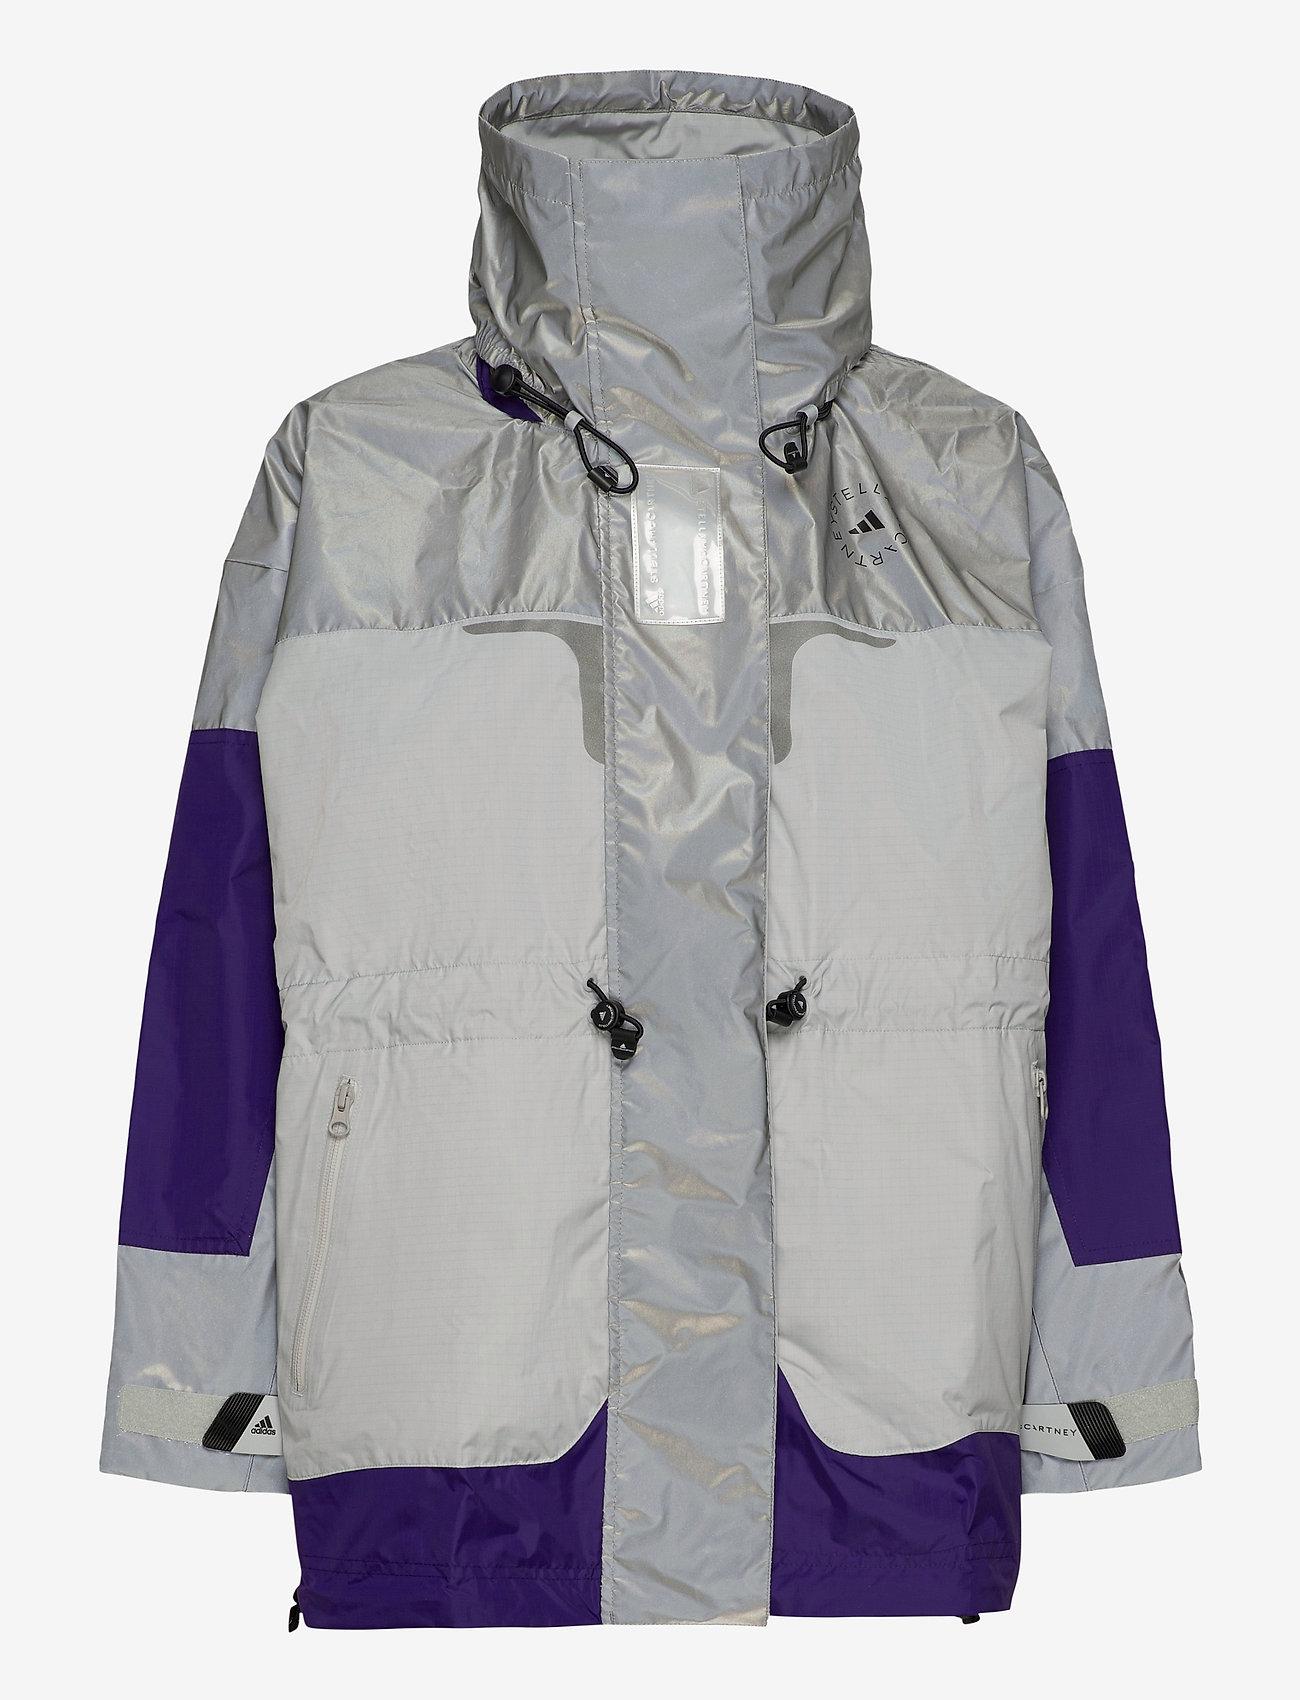 adidas by Stella McCartney - URBXTR SH JKT - training jackets - refsil/clonix/cpurpl - 2